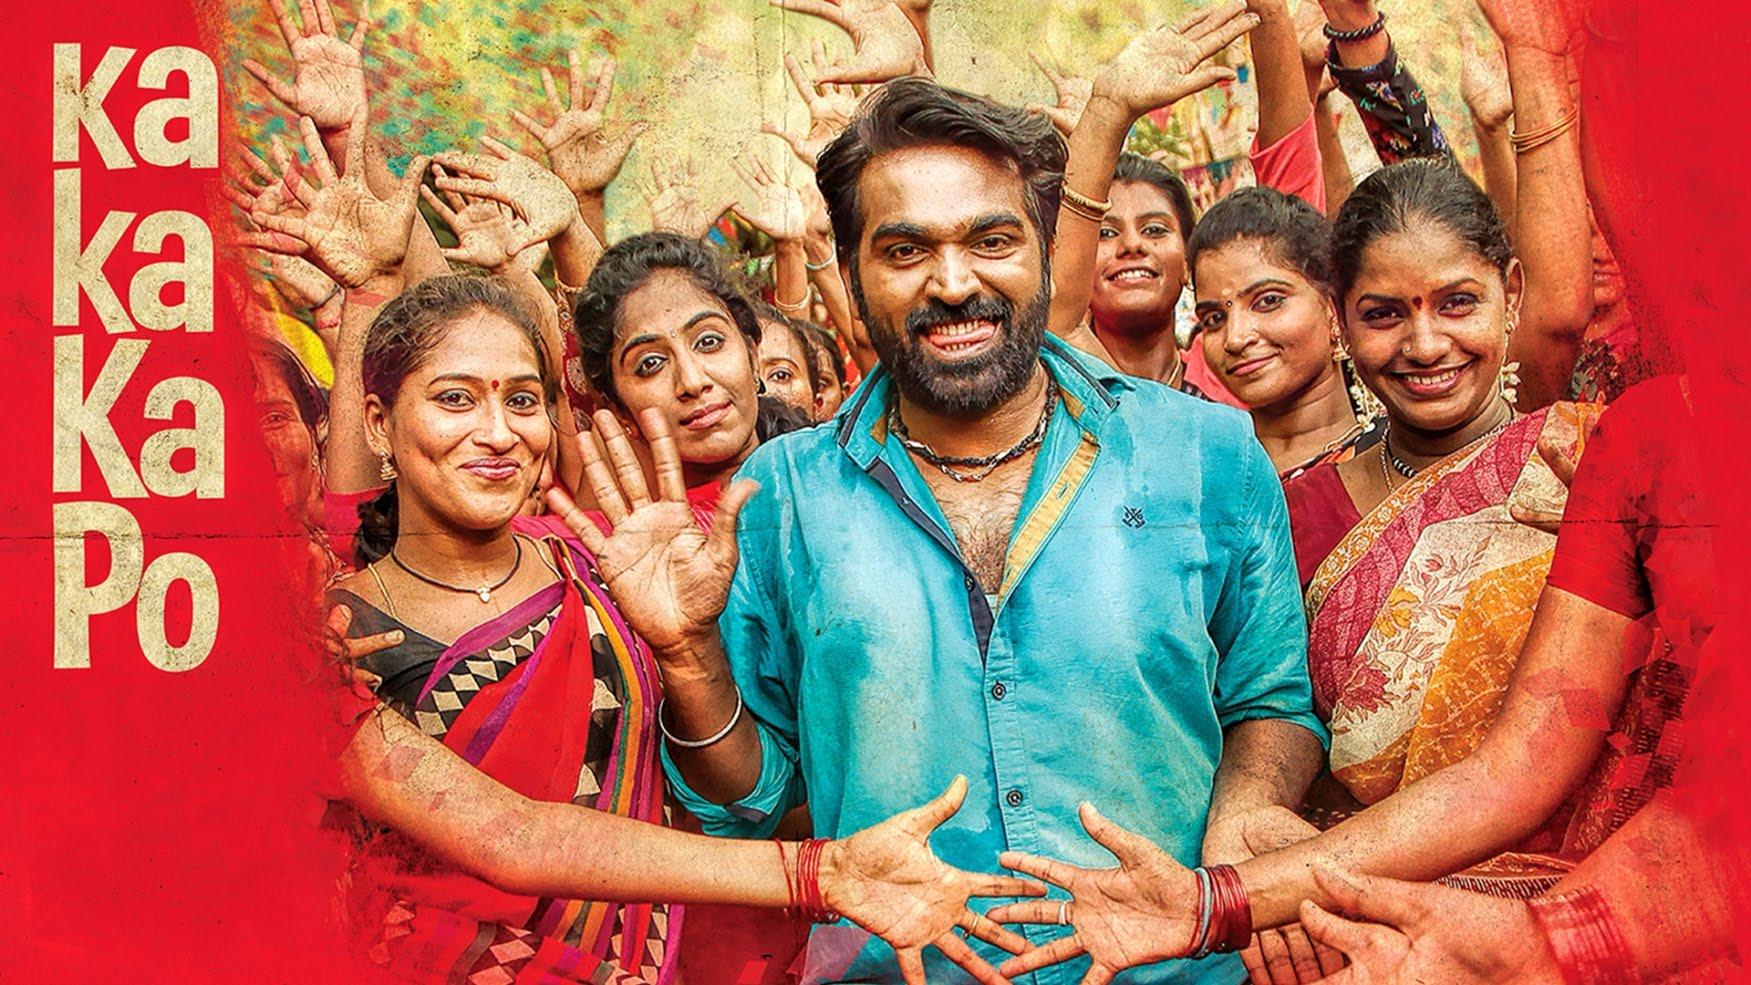 Kadhalum kadanthu pogum tamil film poster